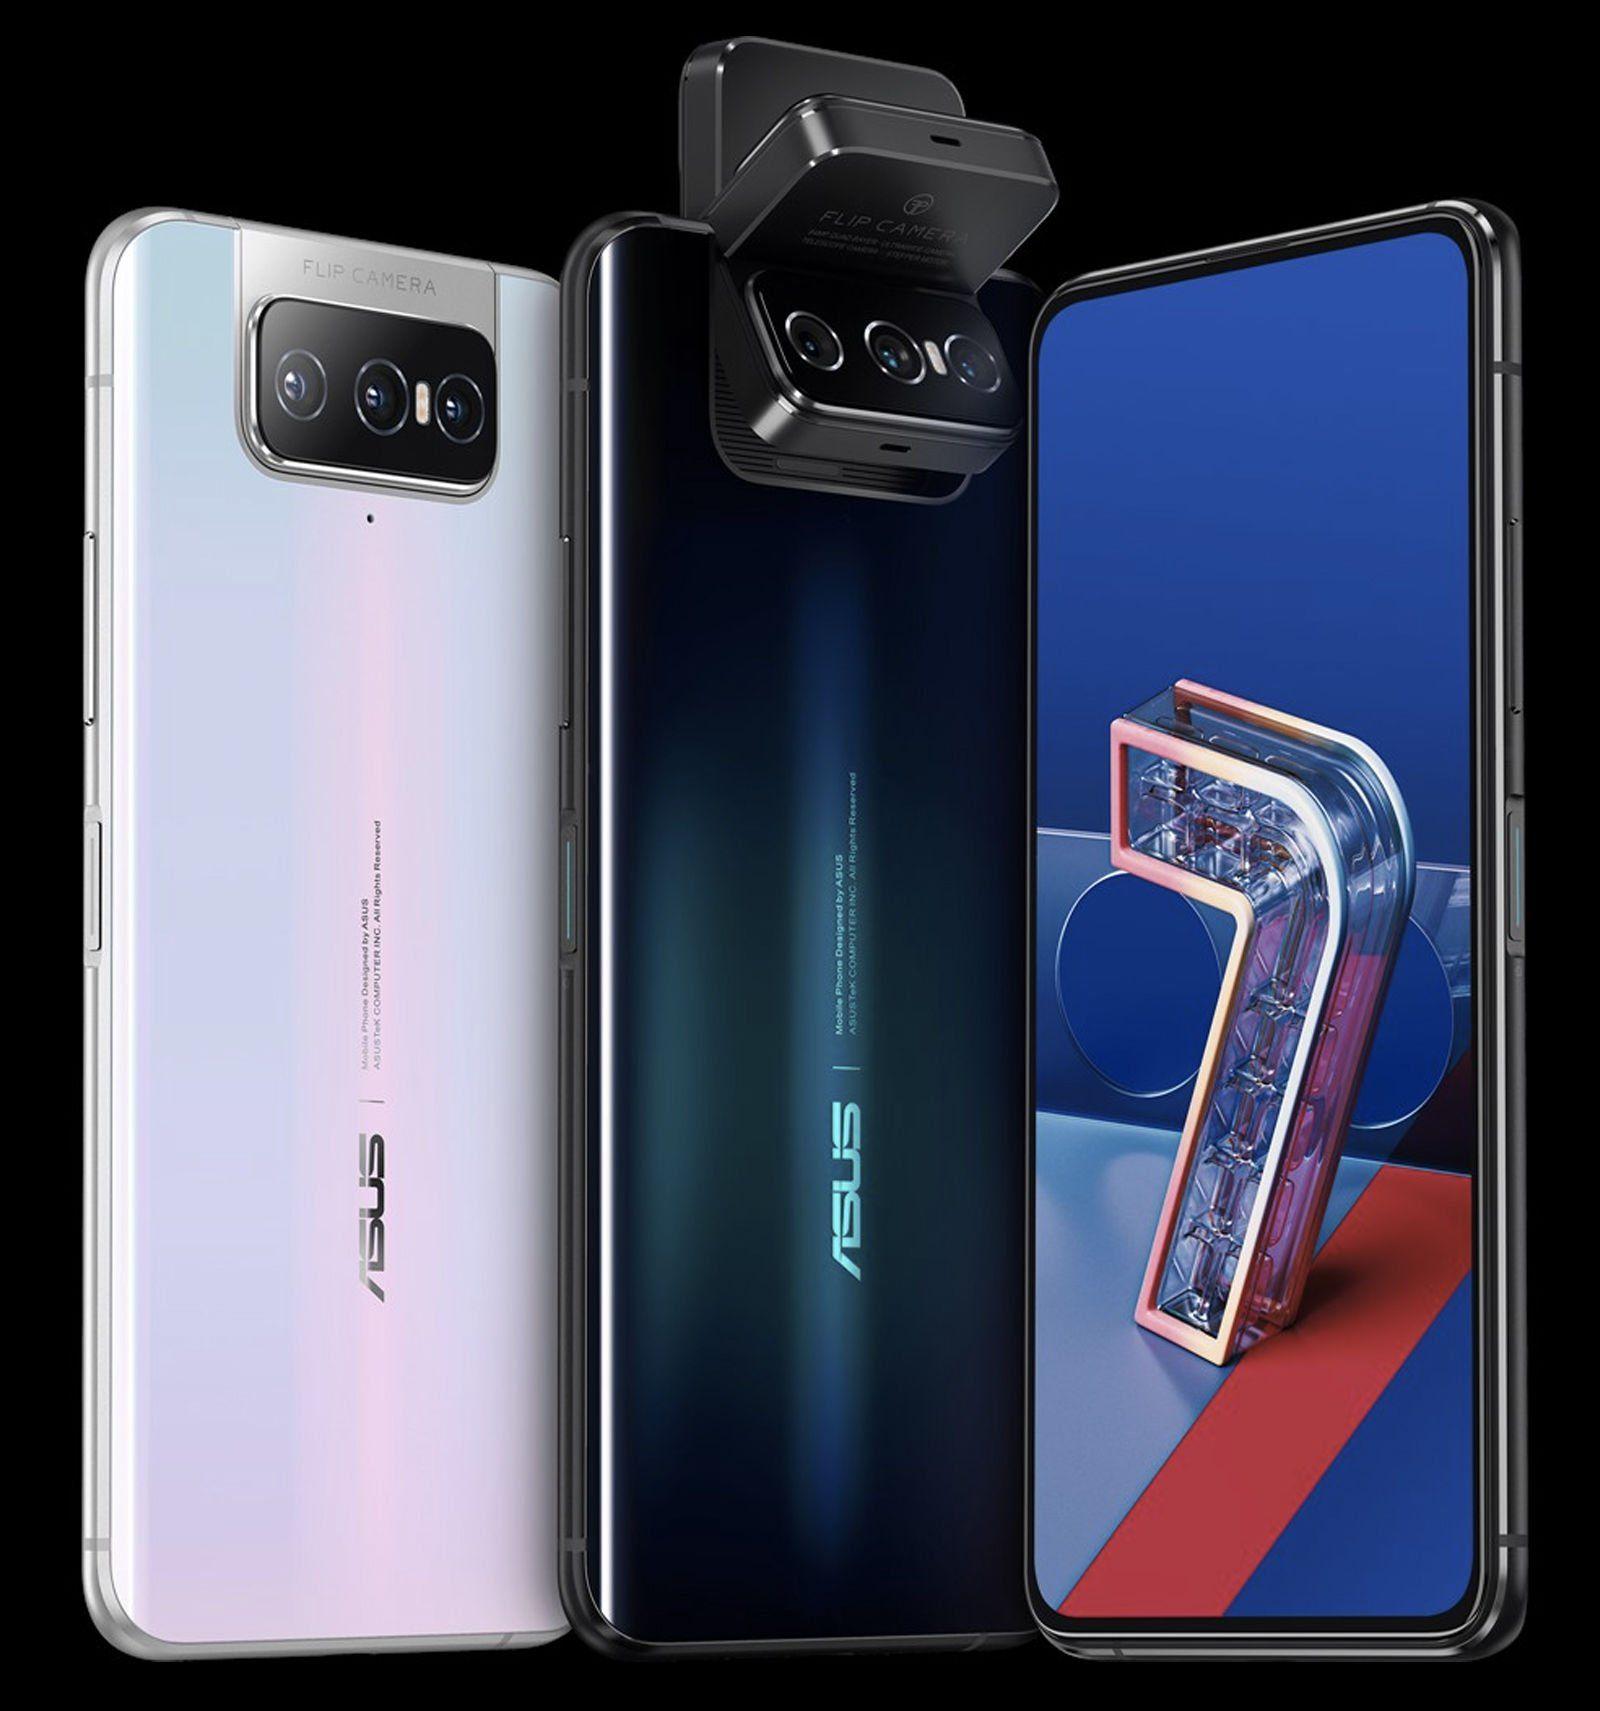 Asus Zenfone 7 Smartphone 8GB 128GB 90hz AMOLED 5000mAh 5G - £688.90 / Pro £785.90 @ Alternate